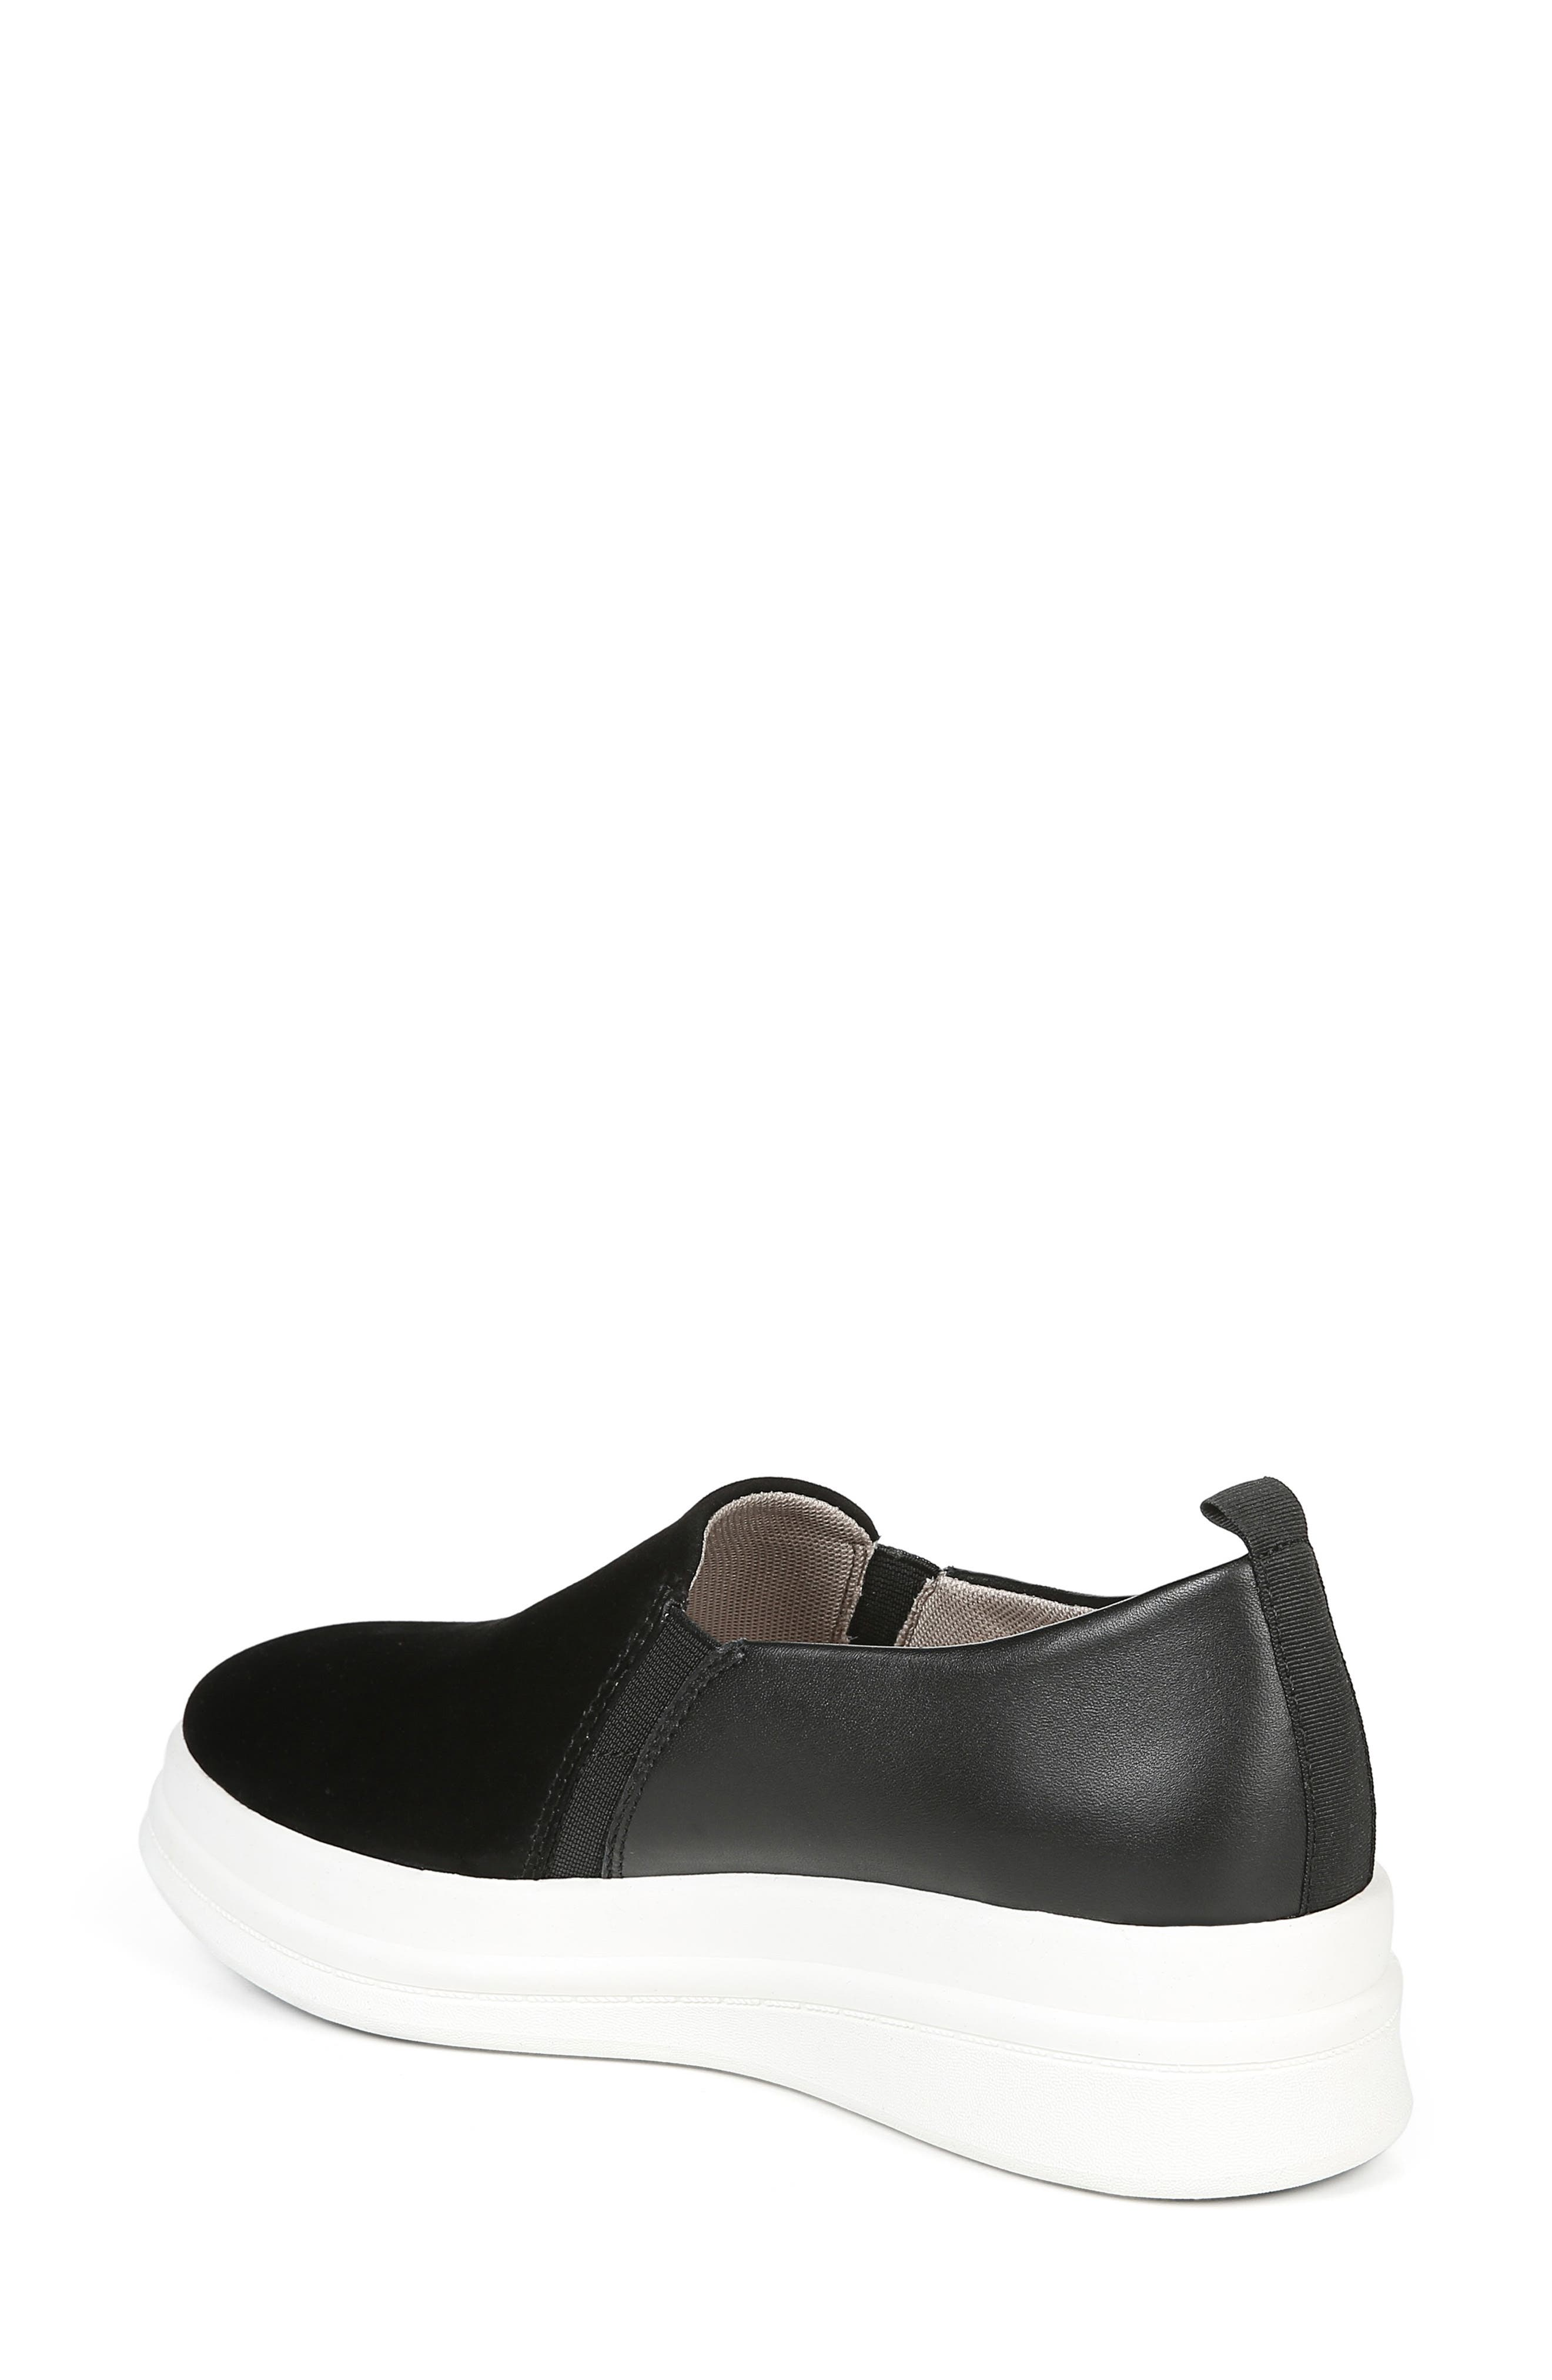 ,                             Yola Slip-On Sneaker,                             Alternate thumbnail 2, color,                             BLACK SUEDE/ LEATHER